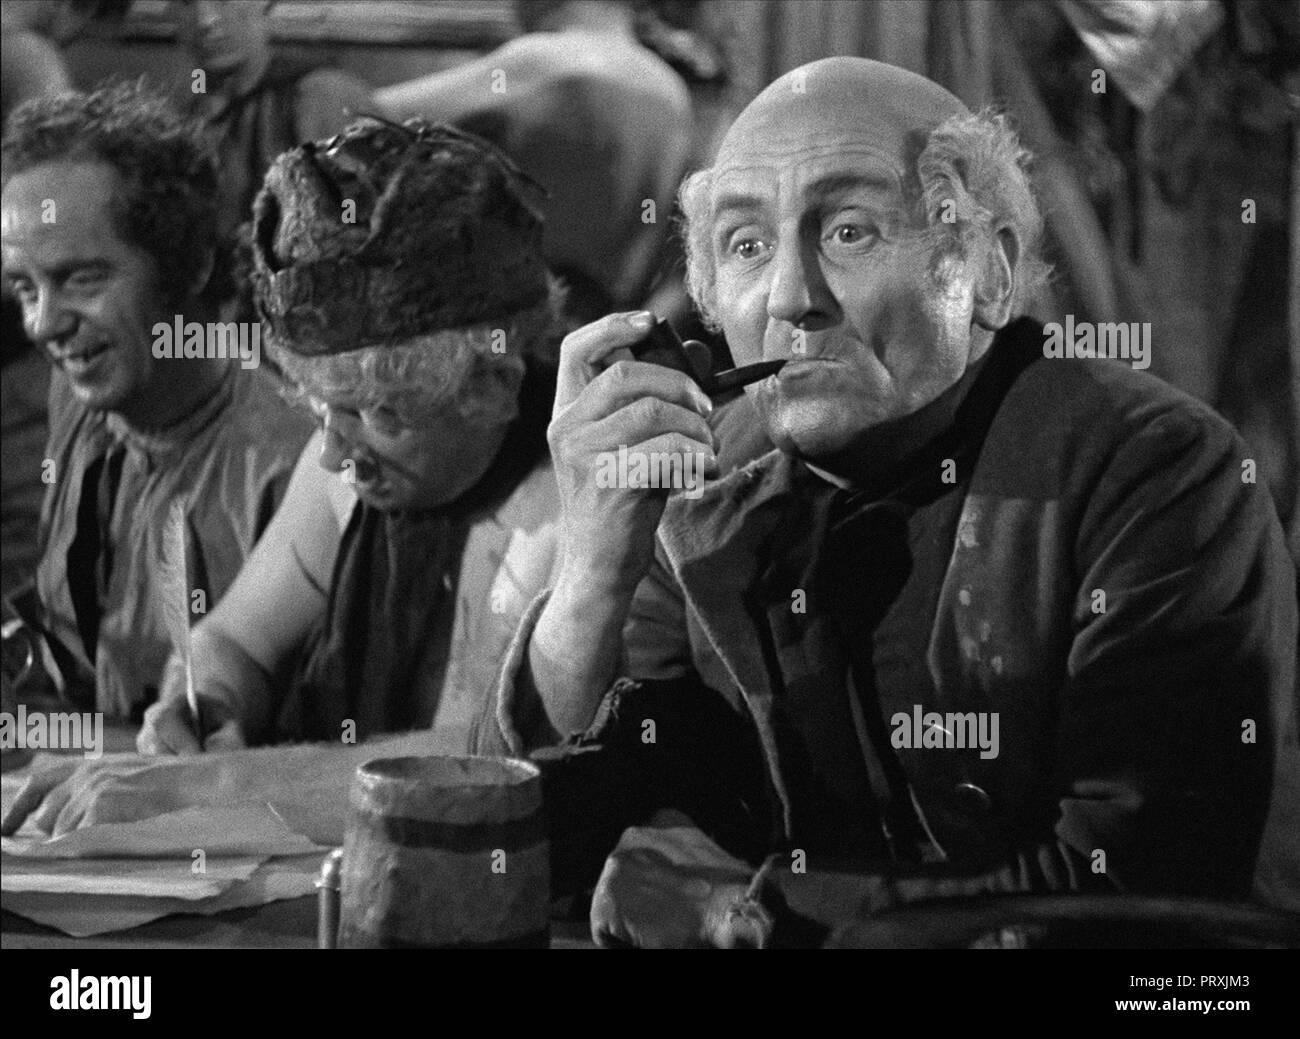 Prod DB © mayflower Bilder/DR L'AUBERGE DE LA JAMAIQUE/LA TAVERNE DE LA JAMAIQUE JAMAICA INN de Alfred Hitchcock 1939 GB Wylie Watson. fumer La Stockbild